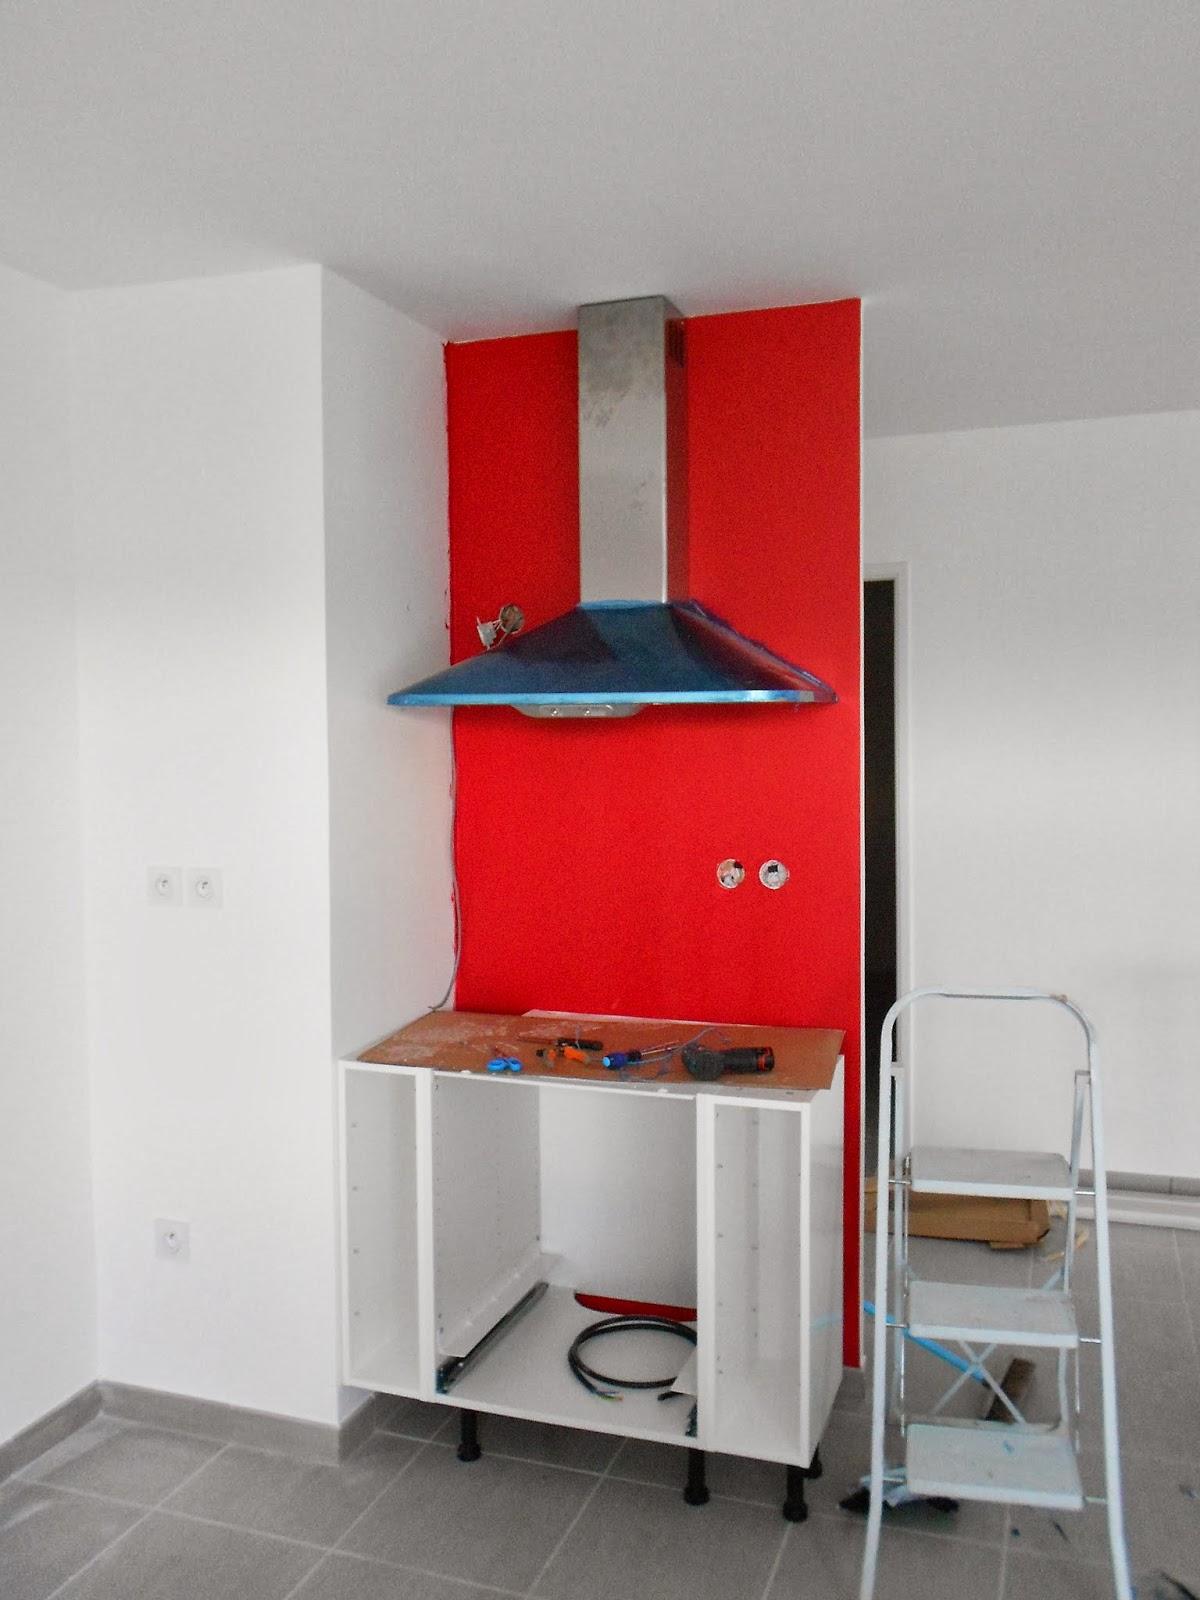 po 39 s cuisine montpellier. Black Bedroom Furniture Sets. Home Design Ideas